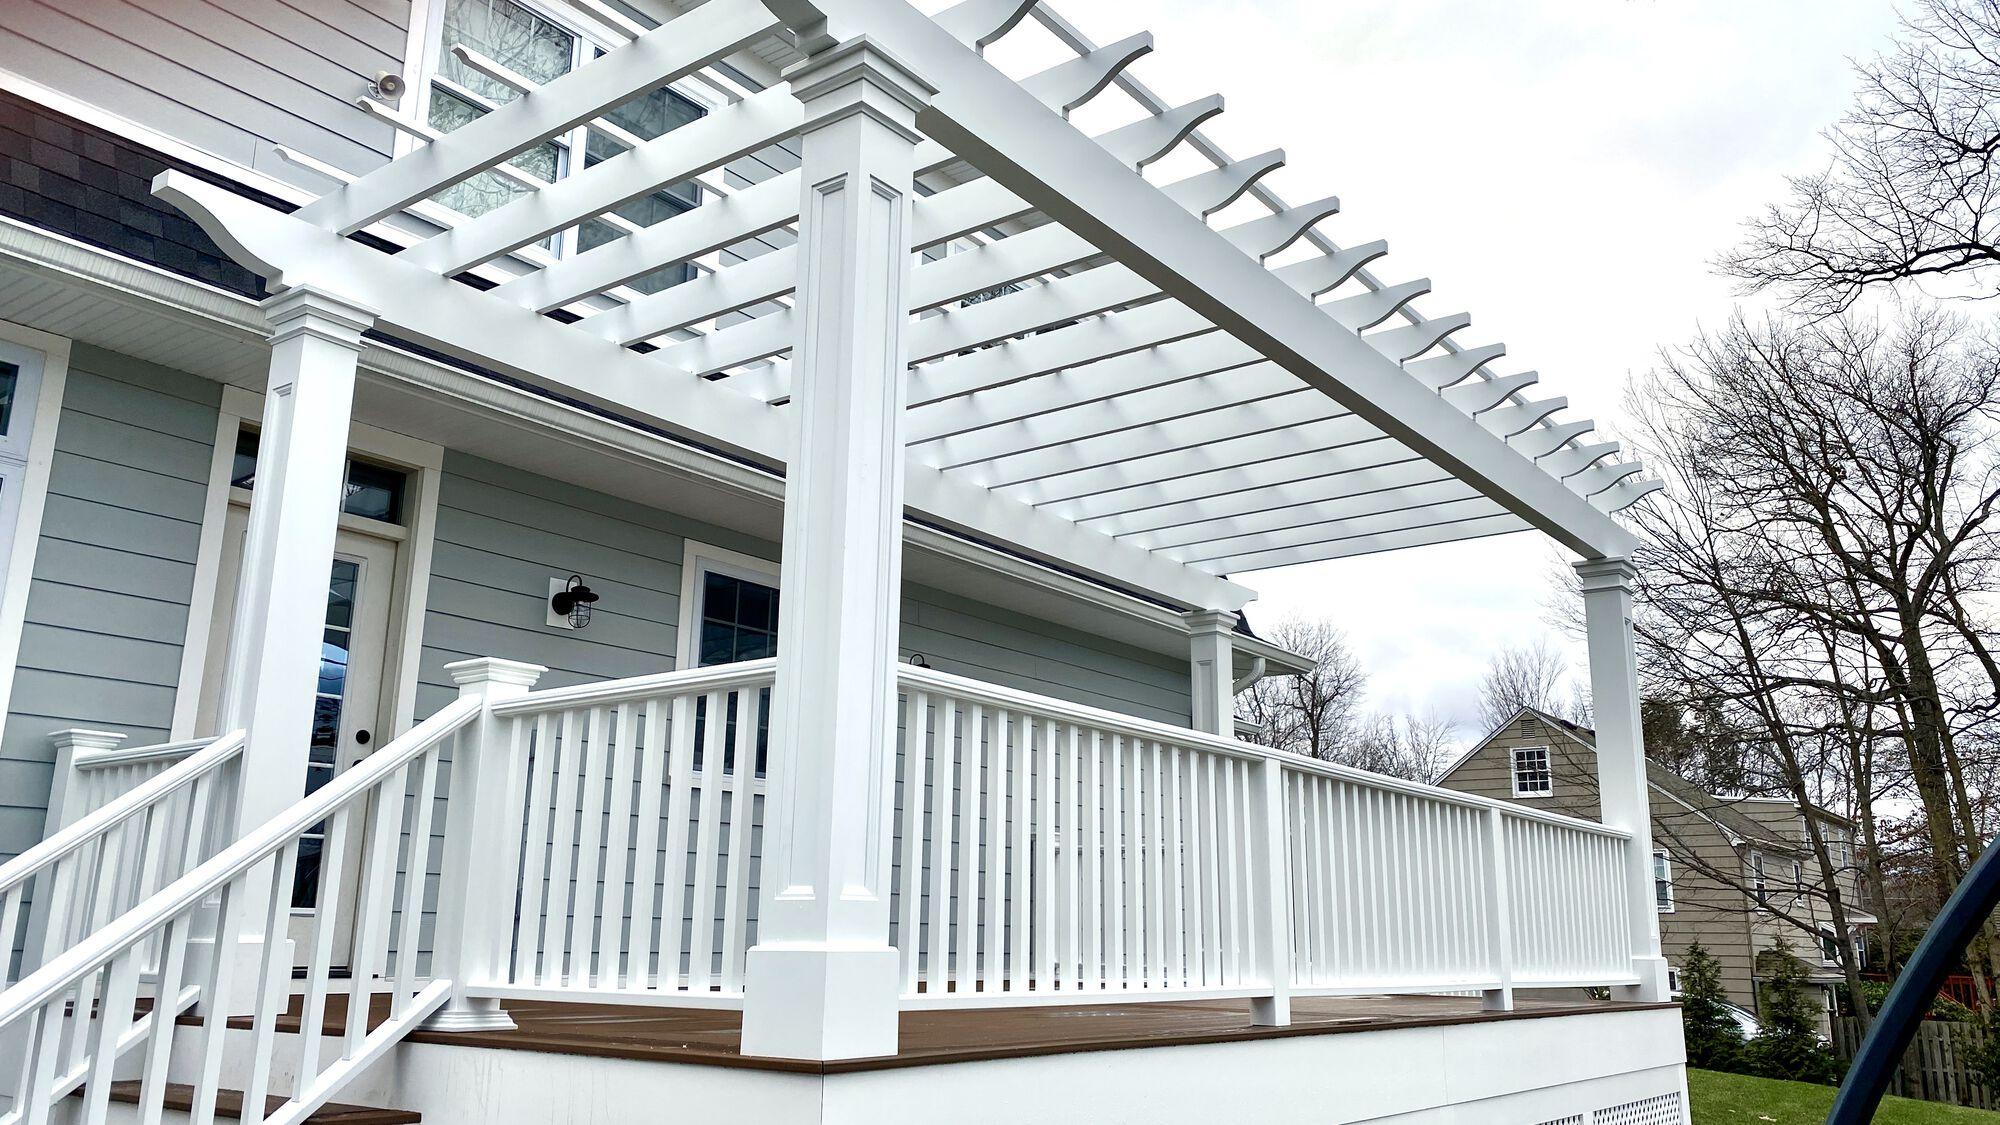 Custom Composite Pergola and Azek Deck in Chatham, Morris County NJ